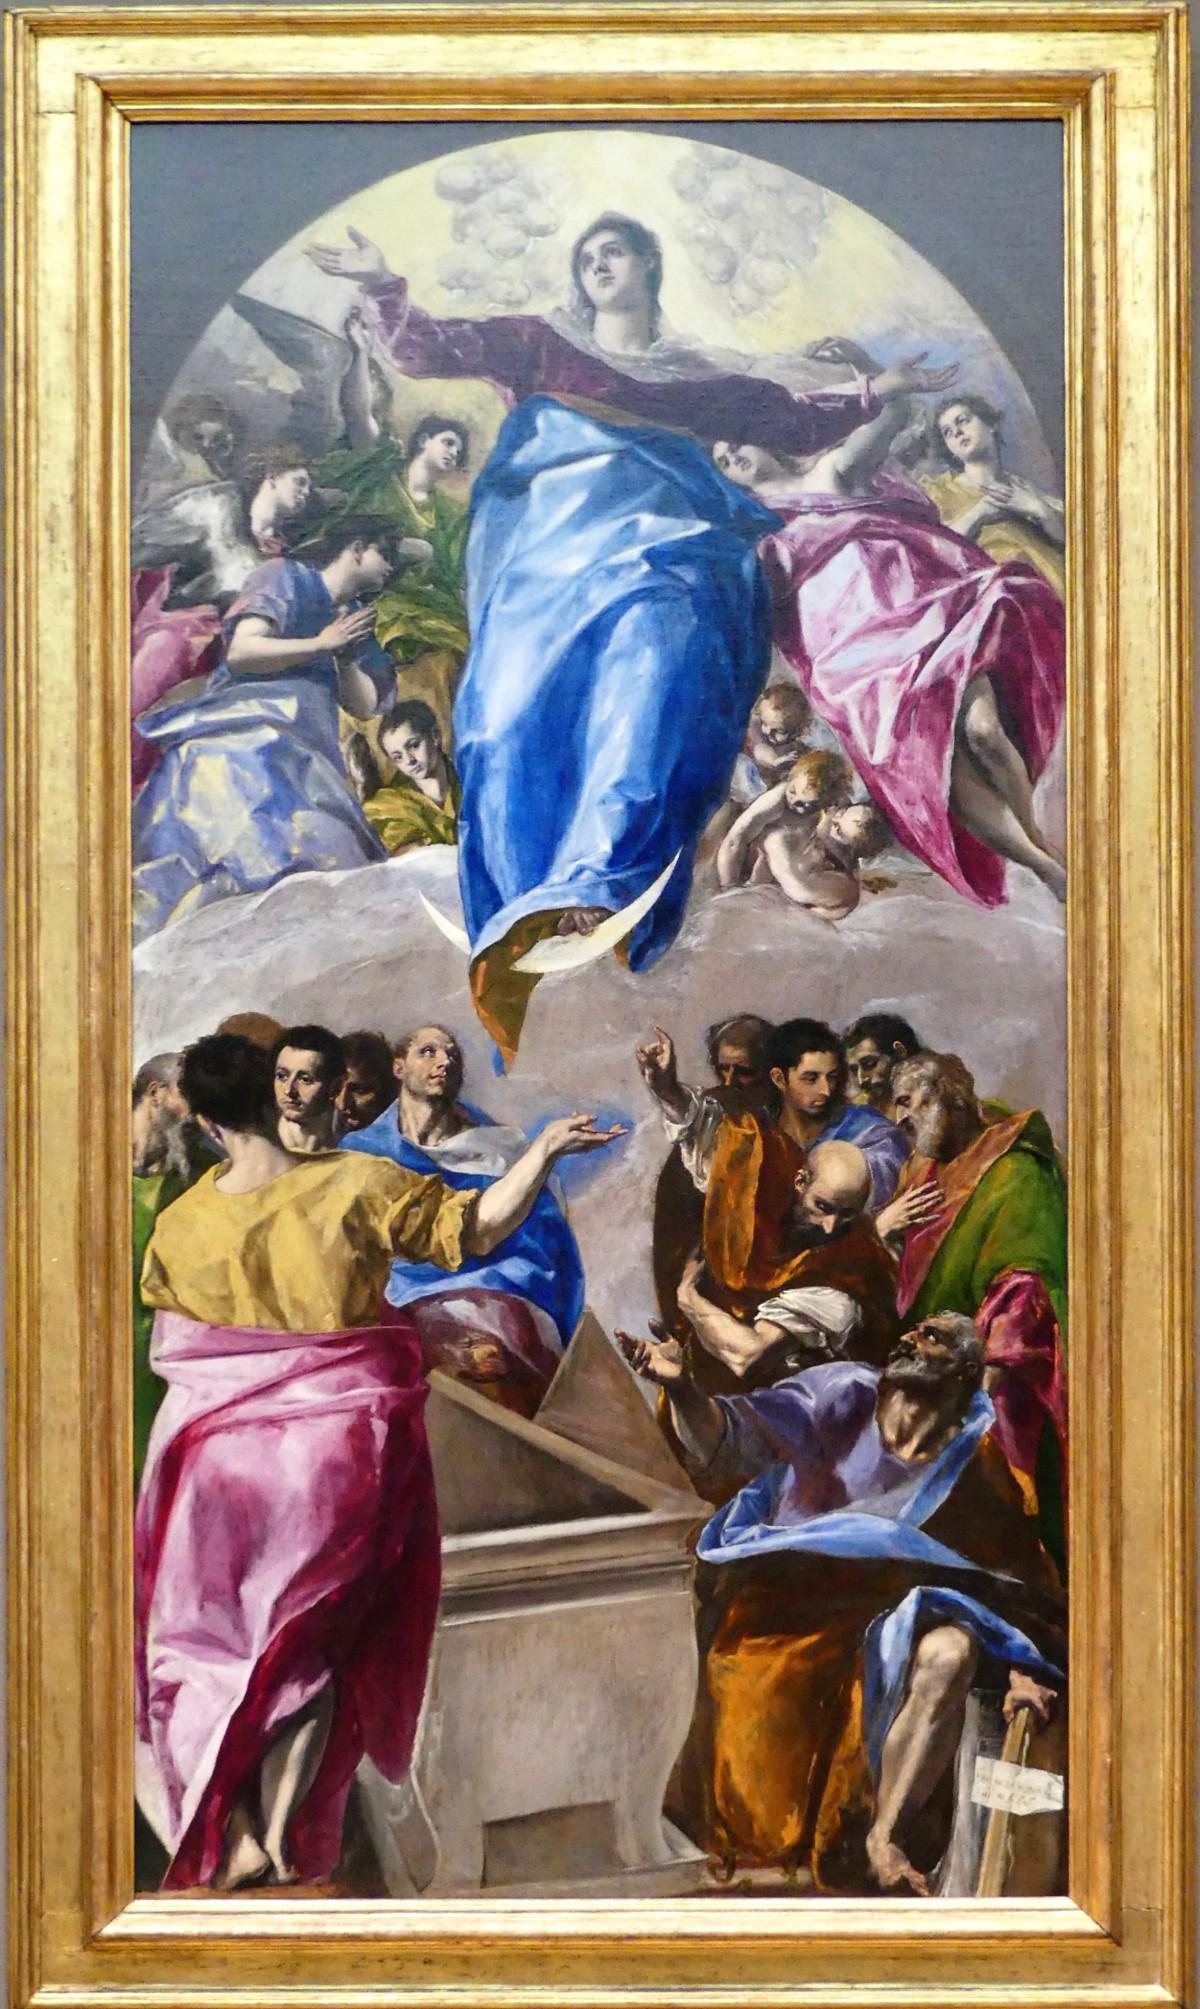 El Greco's The Assumption of the Virgin